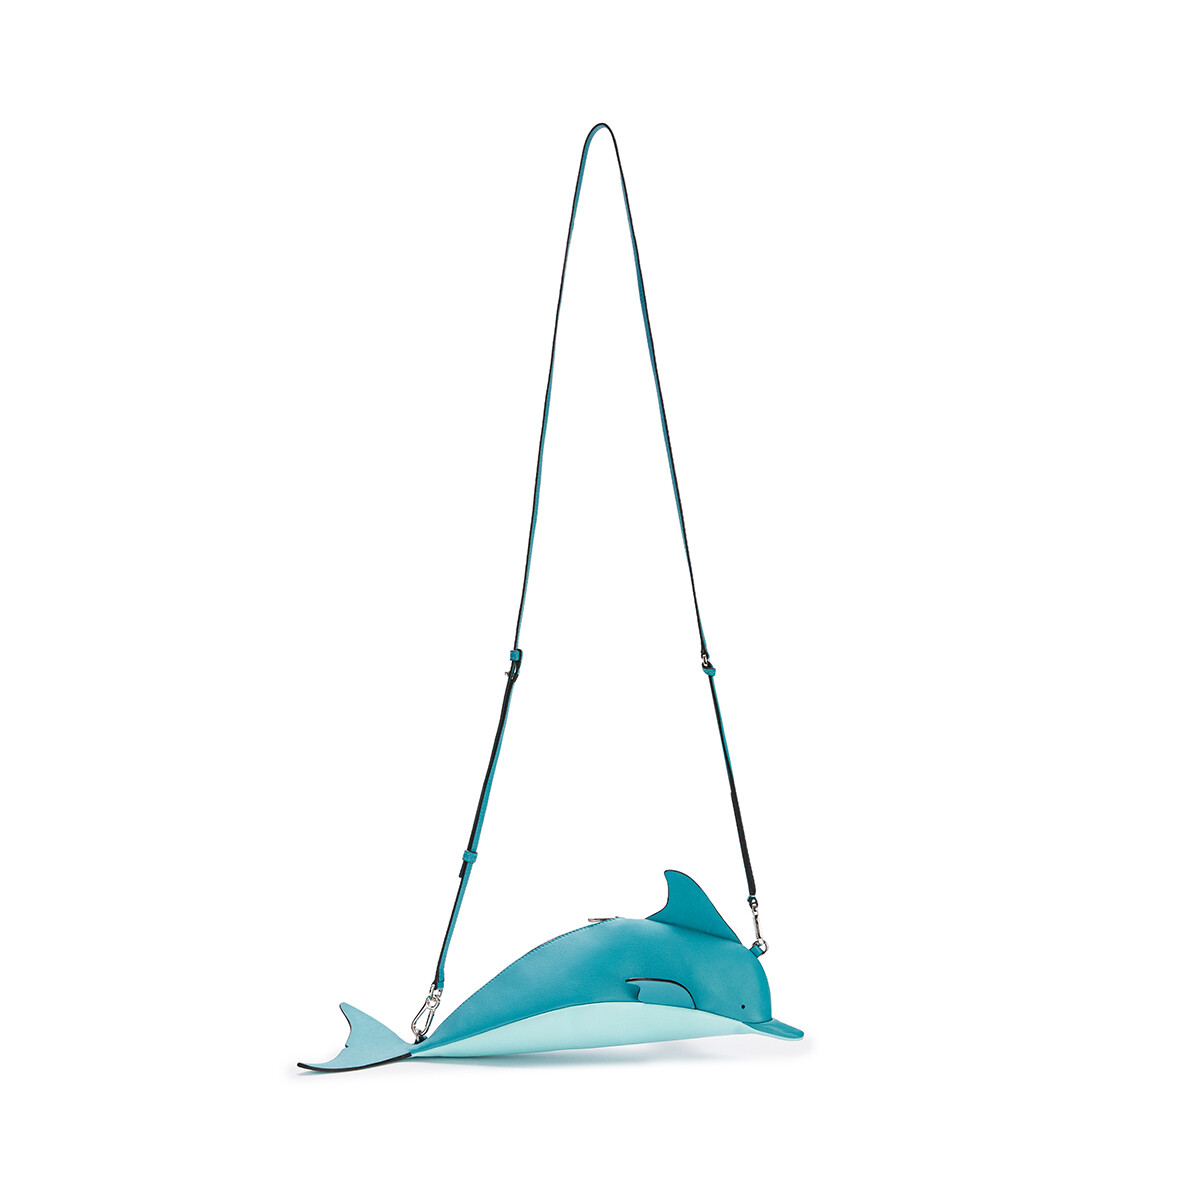 LOEWE 迷你经典小牛皮海豚手袋 Dark Peacock Blue/Aqua front